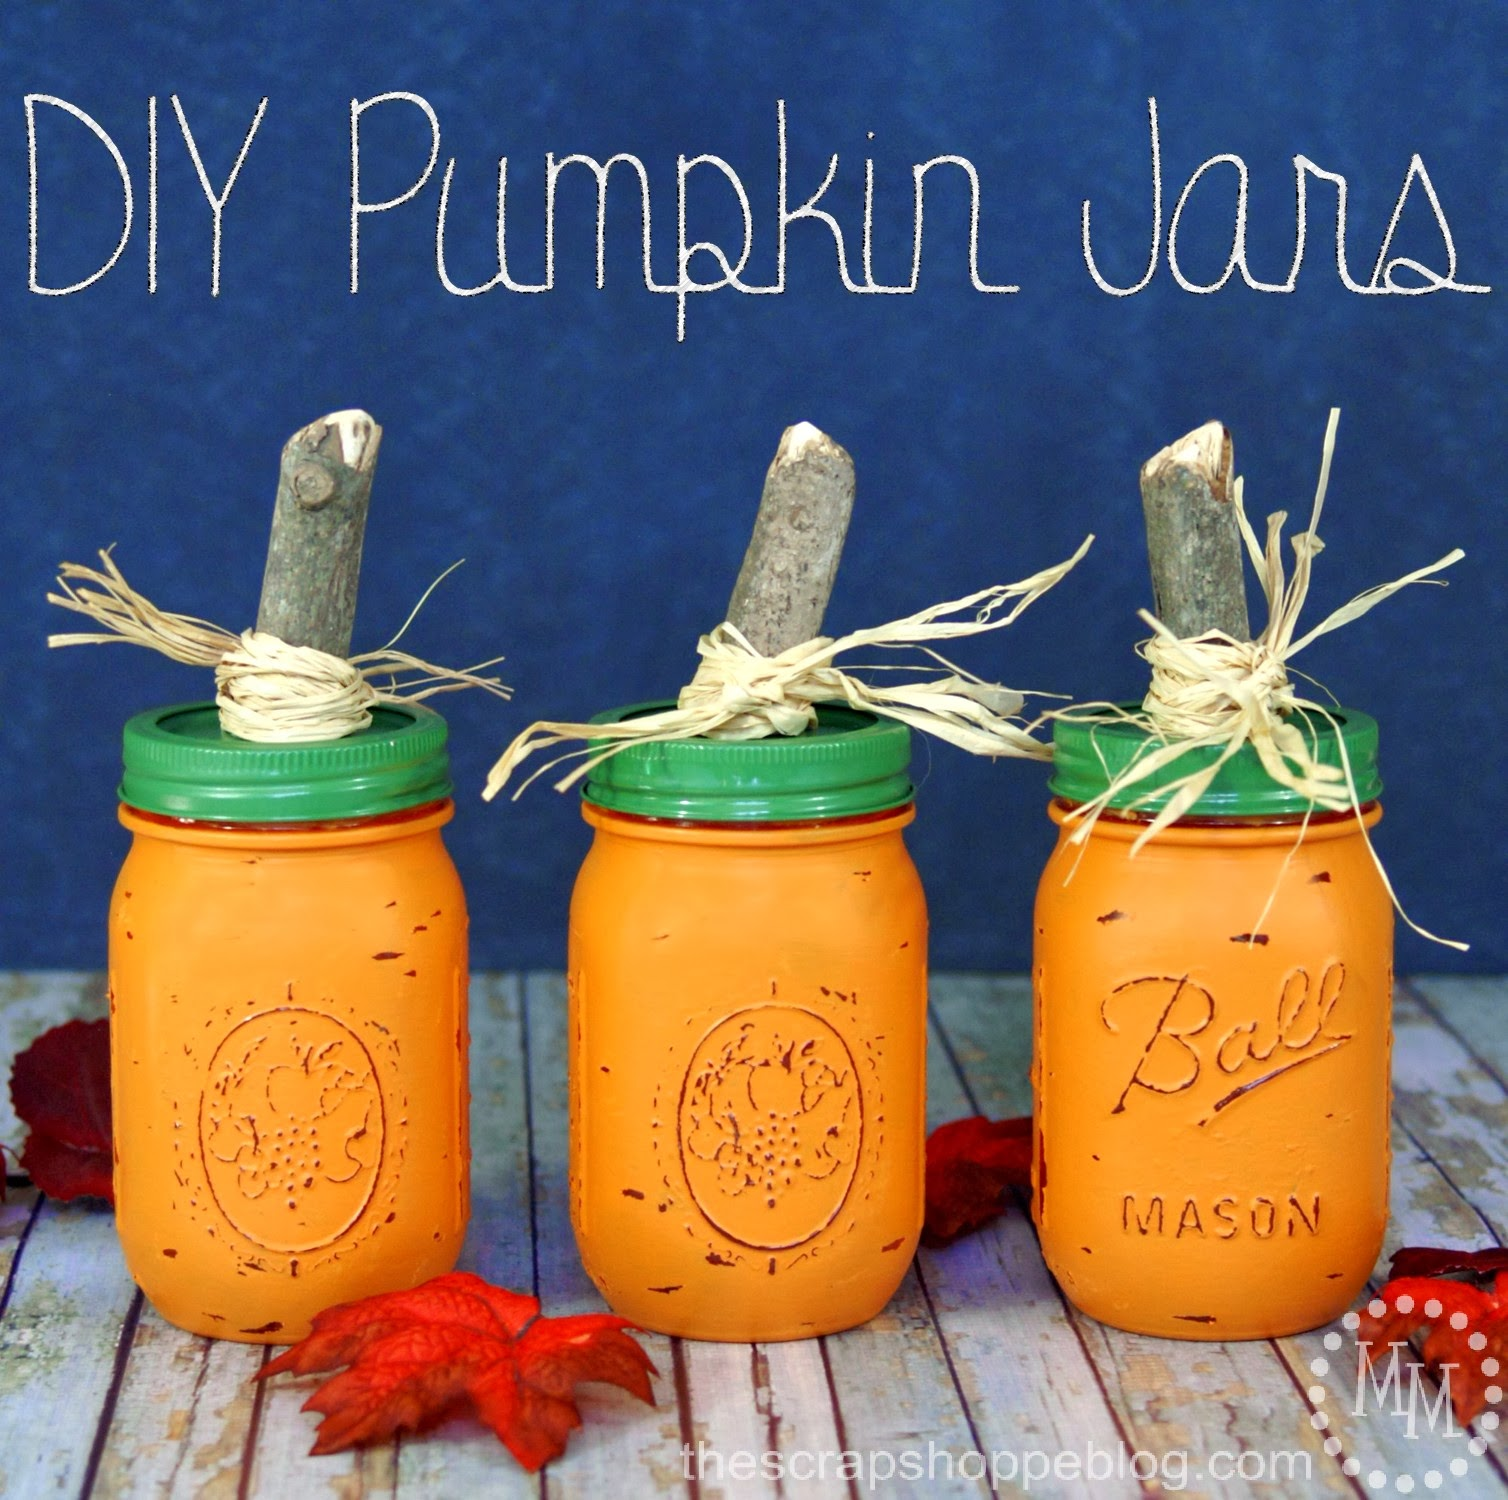 Diy Pumpkin Jars The Scrap Shoppe